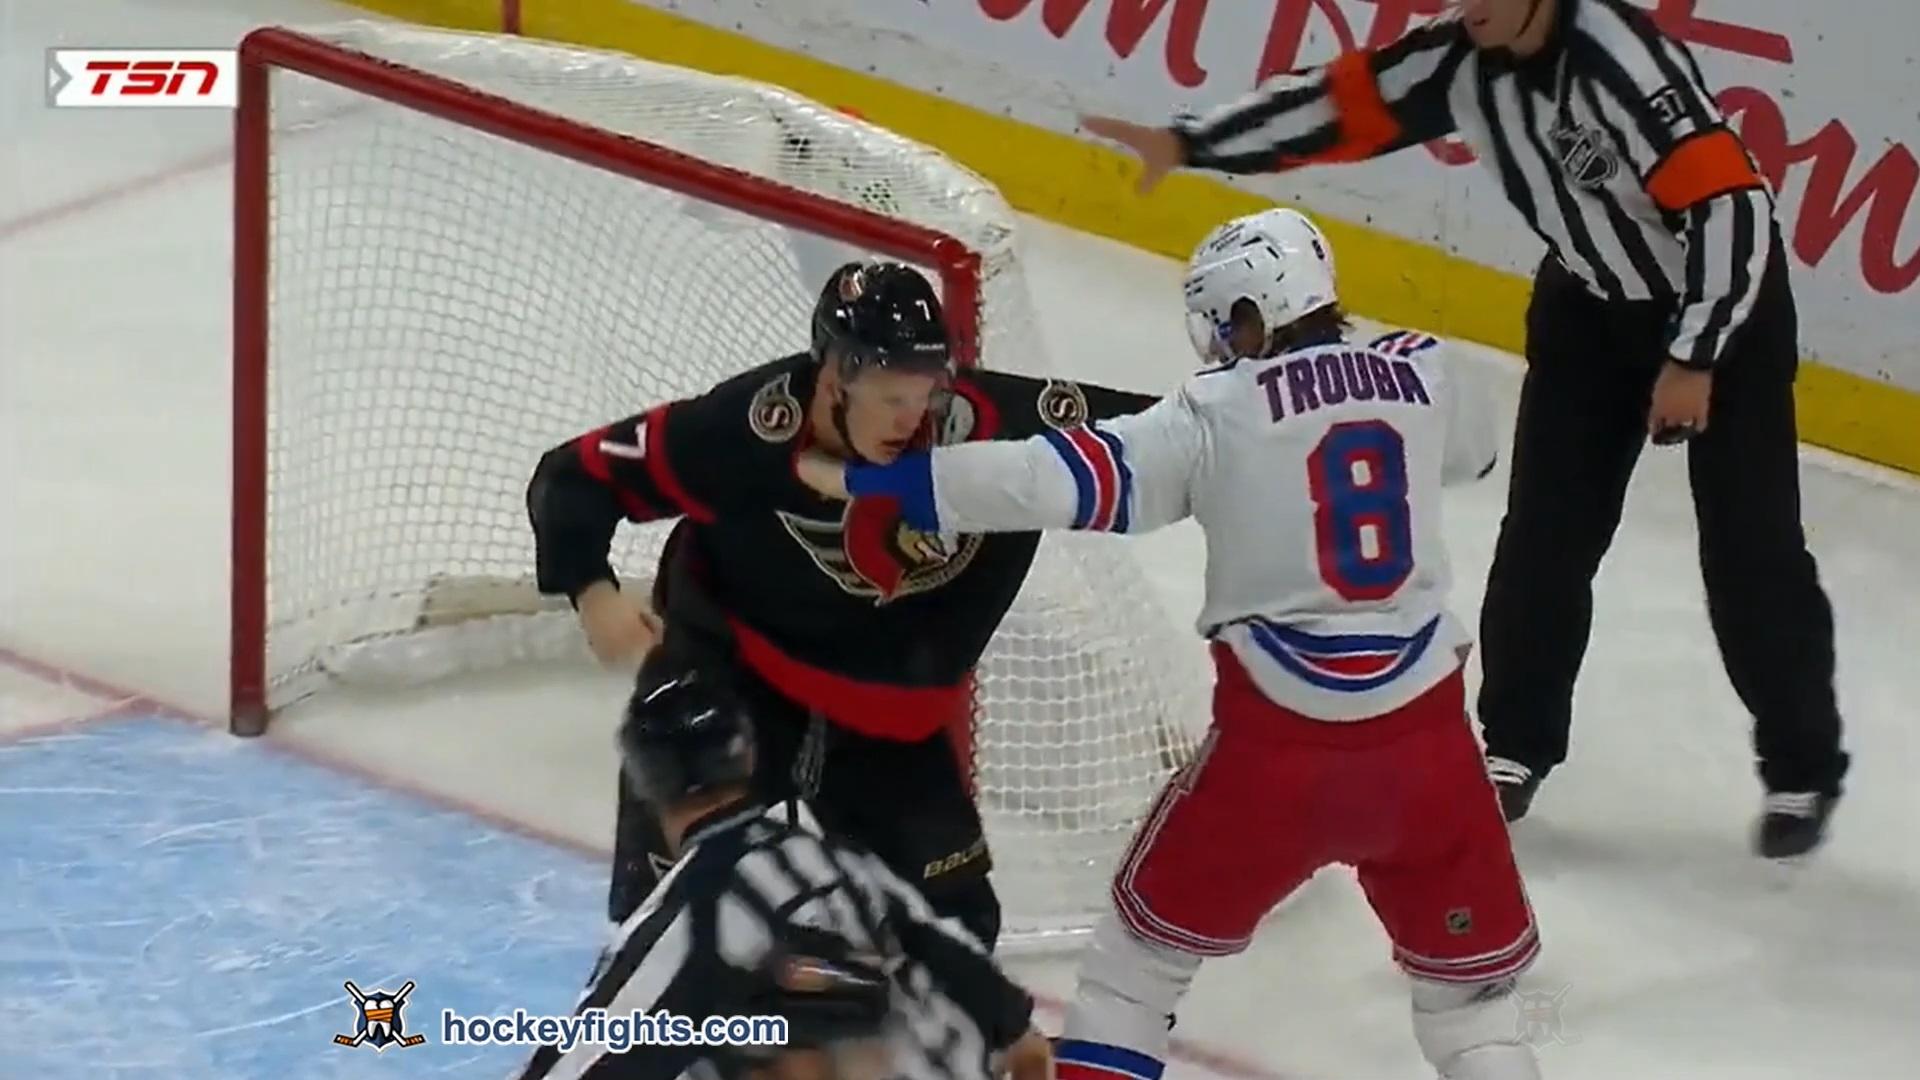 Brady Tkachuk vs. Jacob Trouba